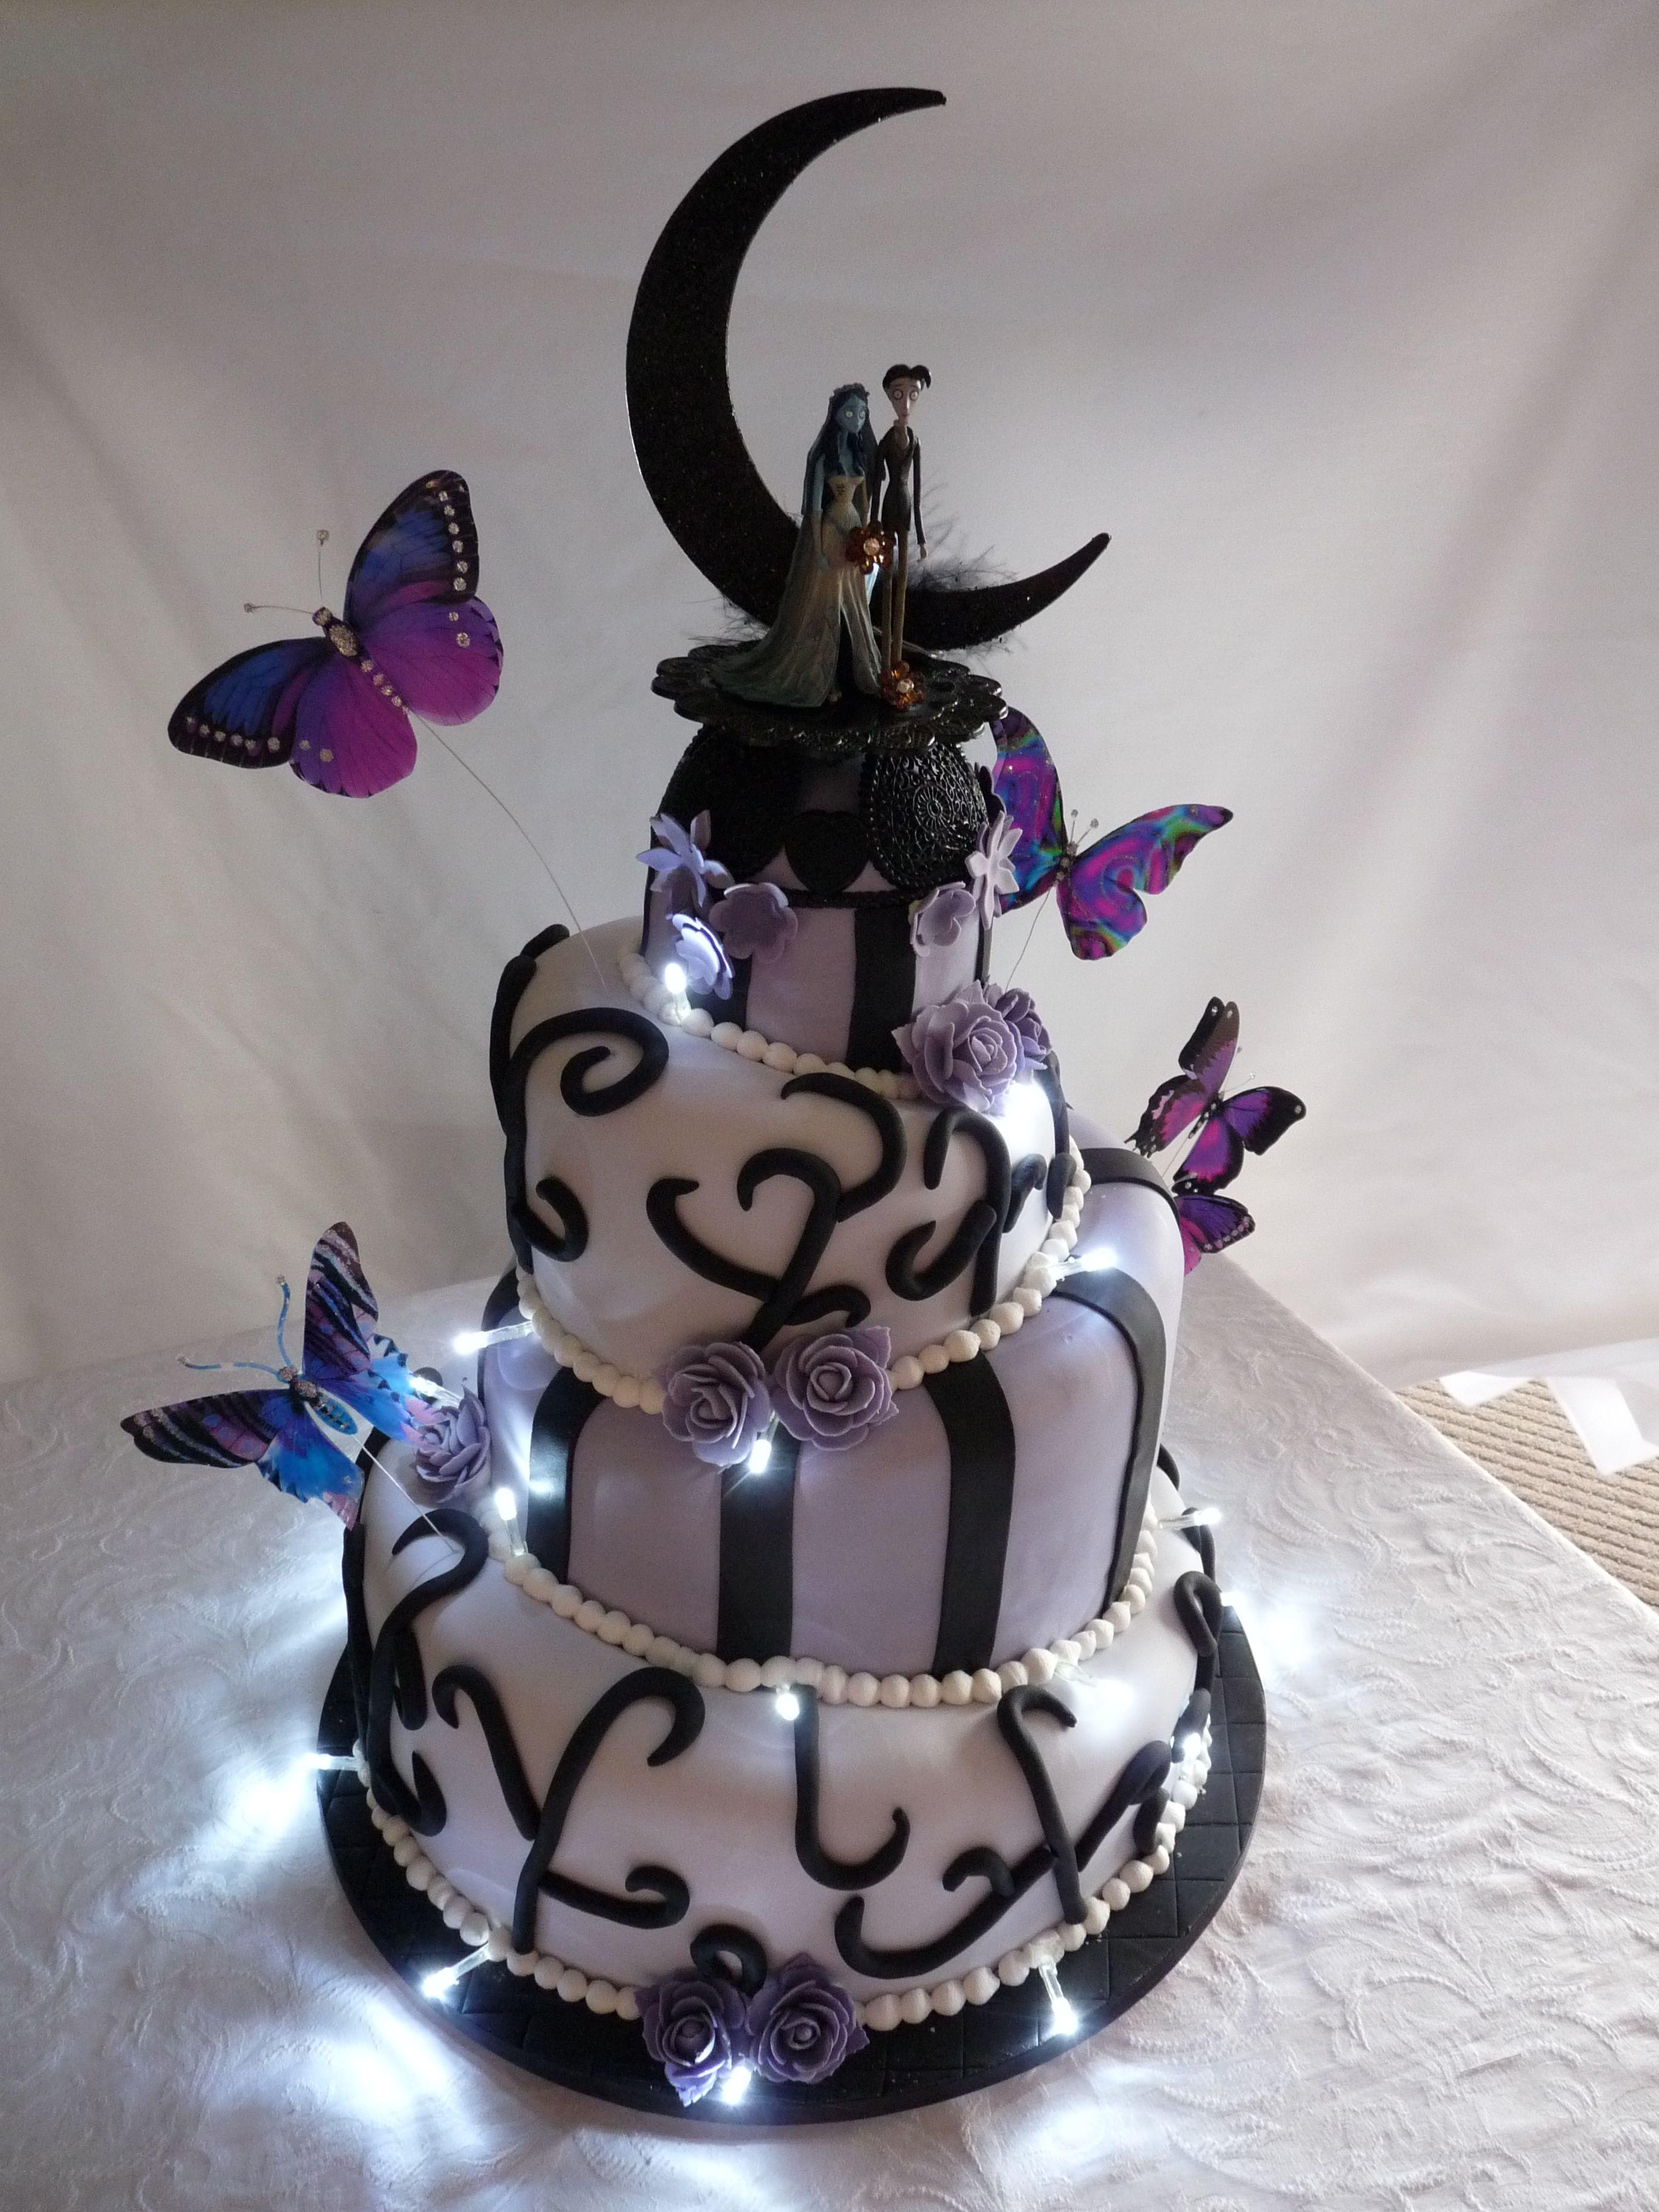 corpse bride wedding cakemandy lynn | edible art